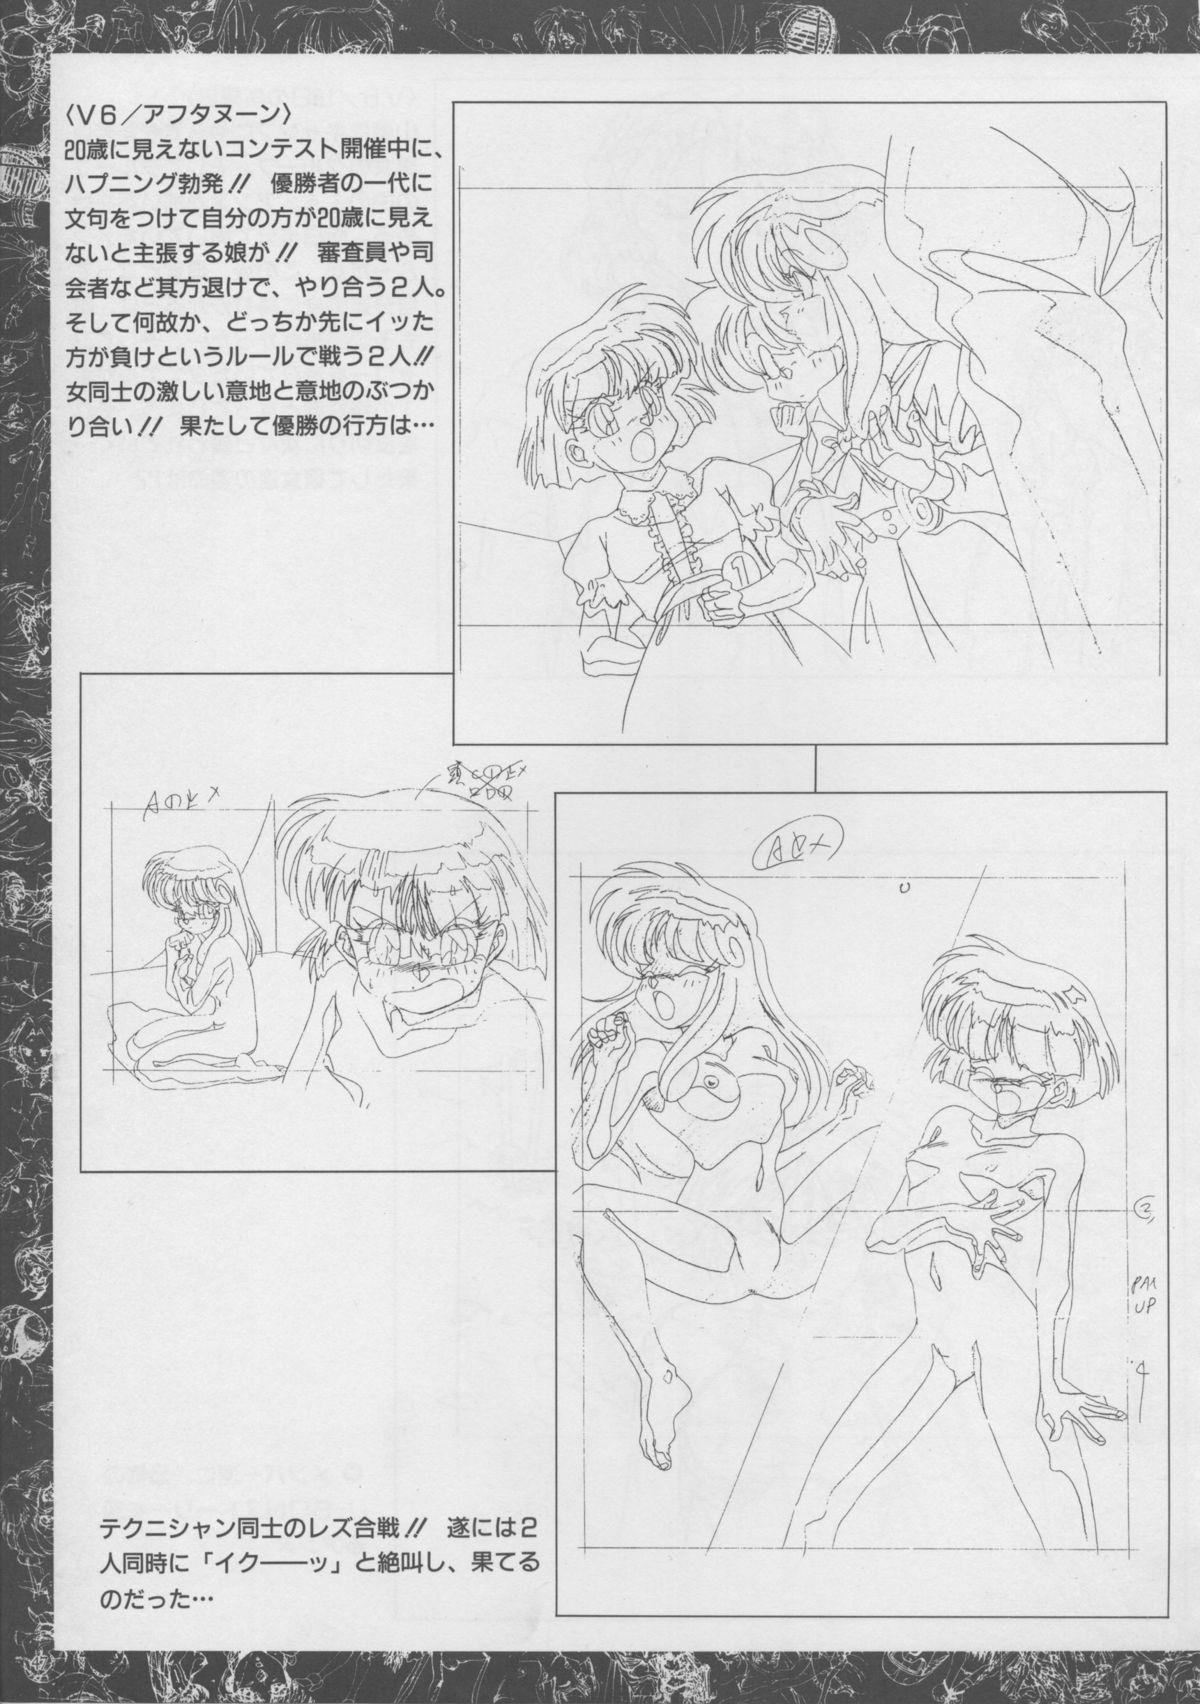 VIPER Series Official Artbook 45